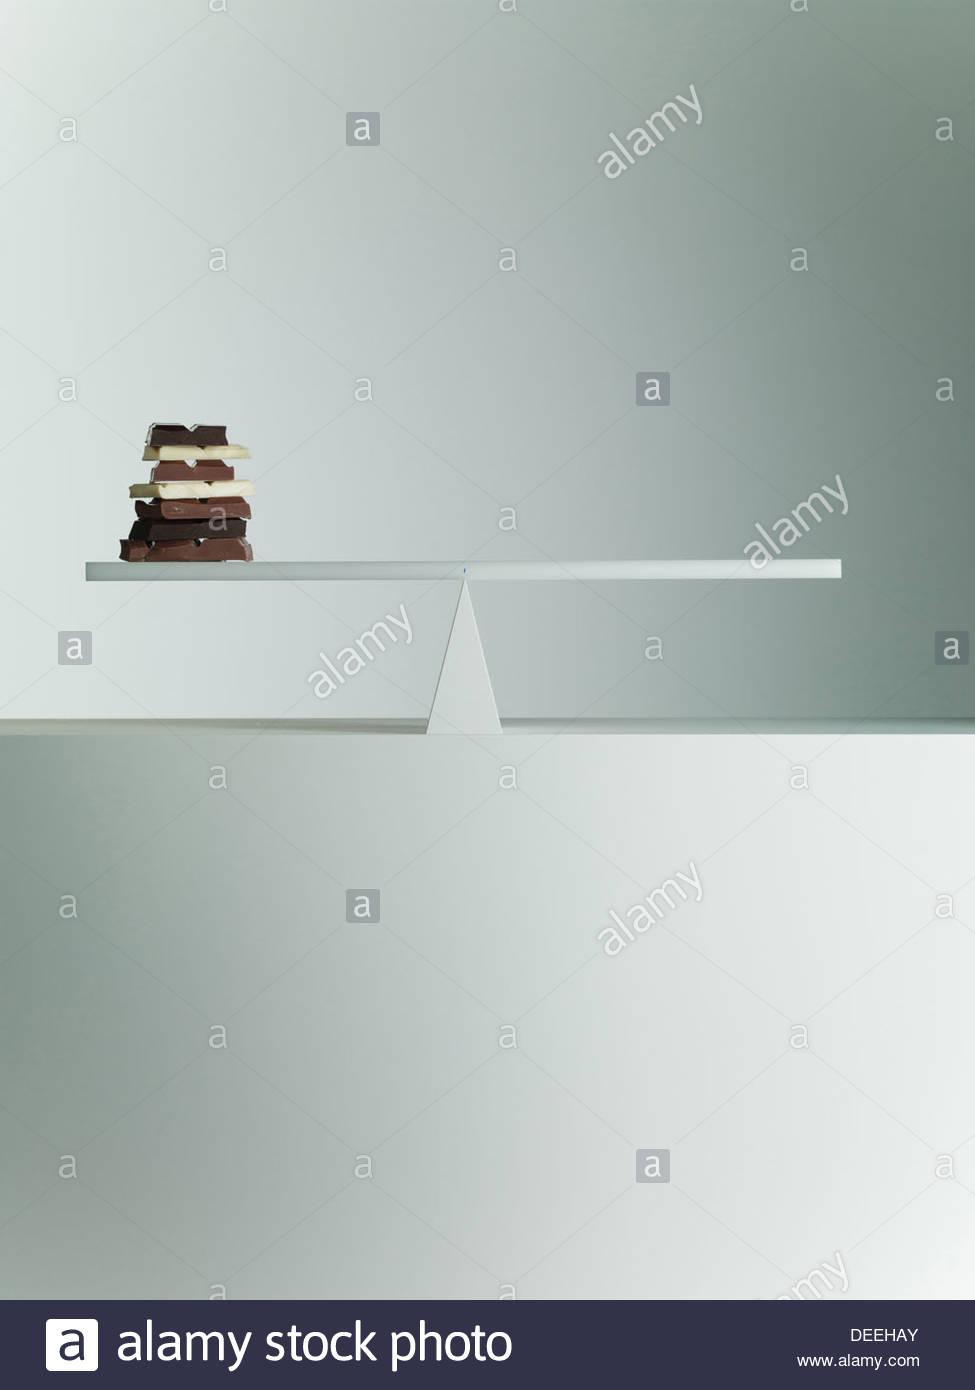 Chocolate bars balanced on seesaw - Stock Image